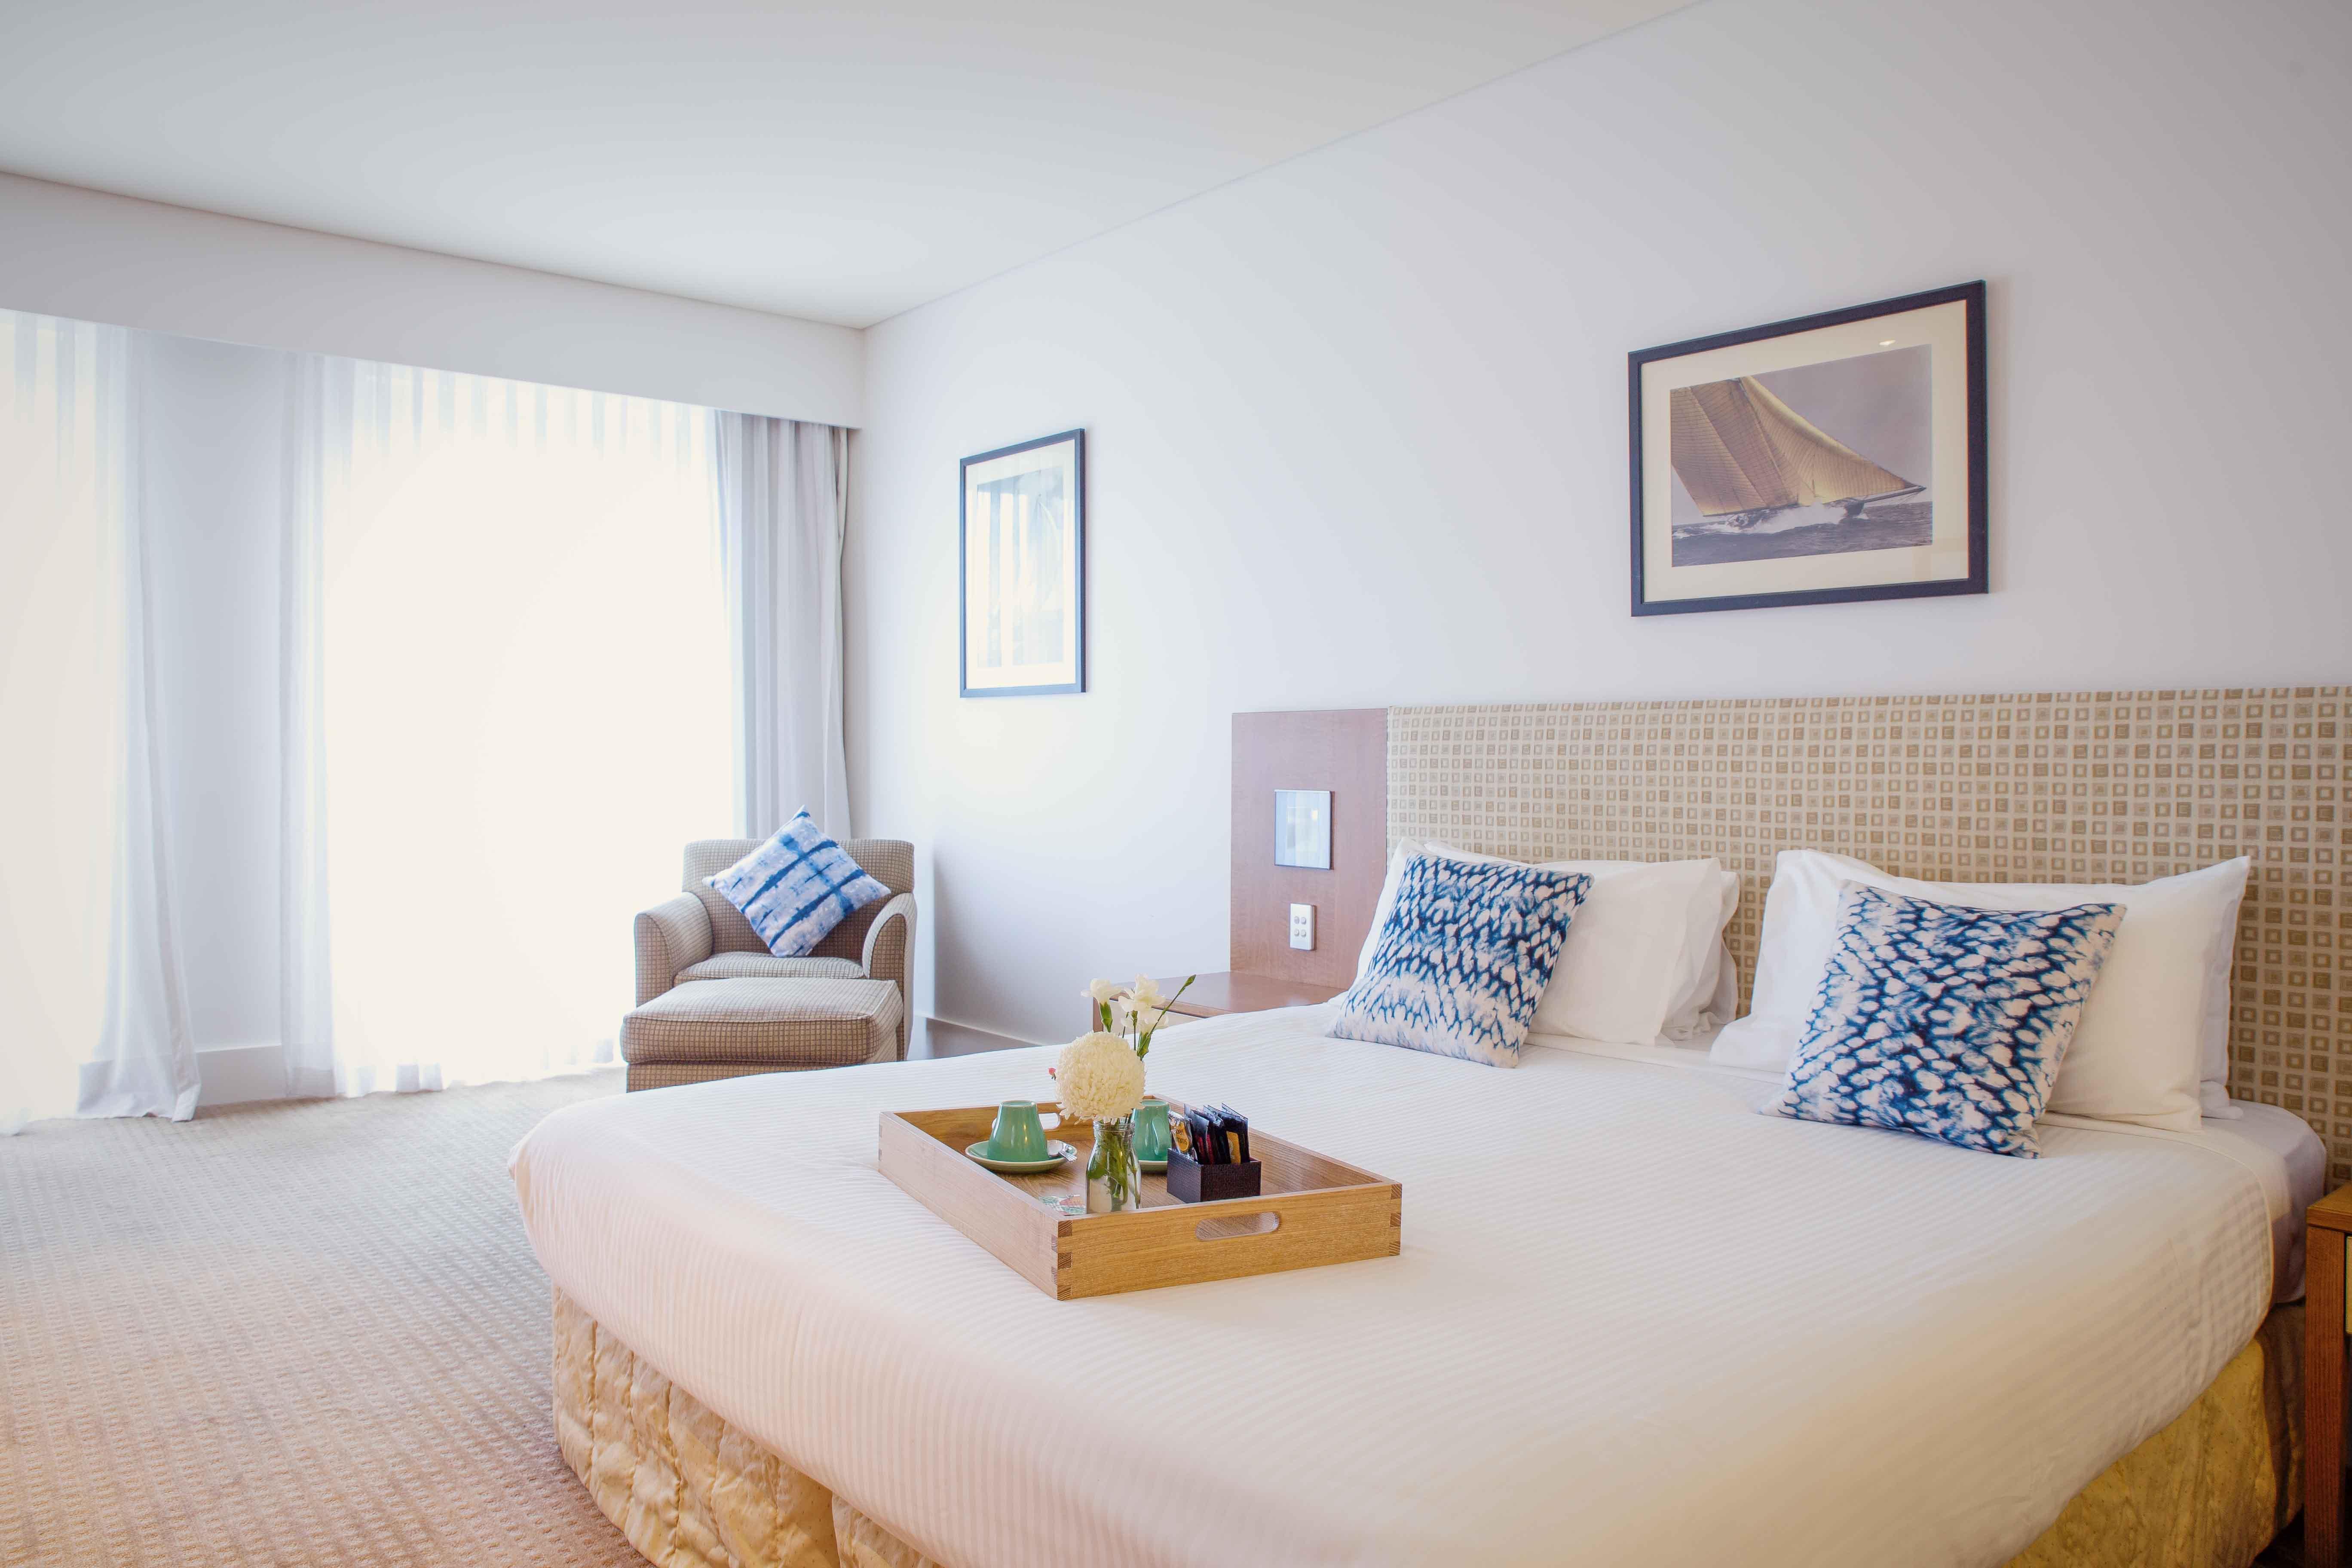 accomodation room types